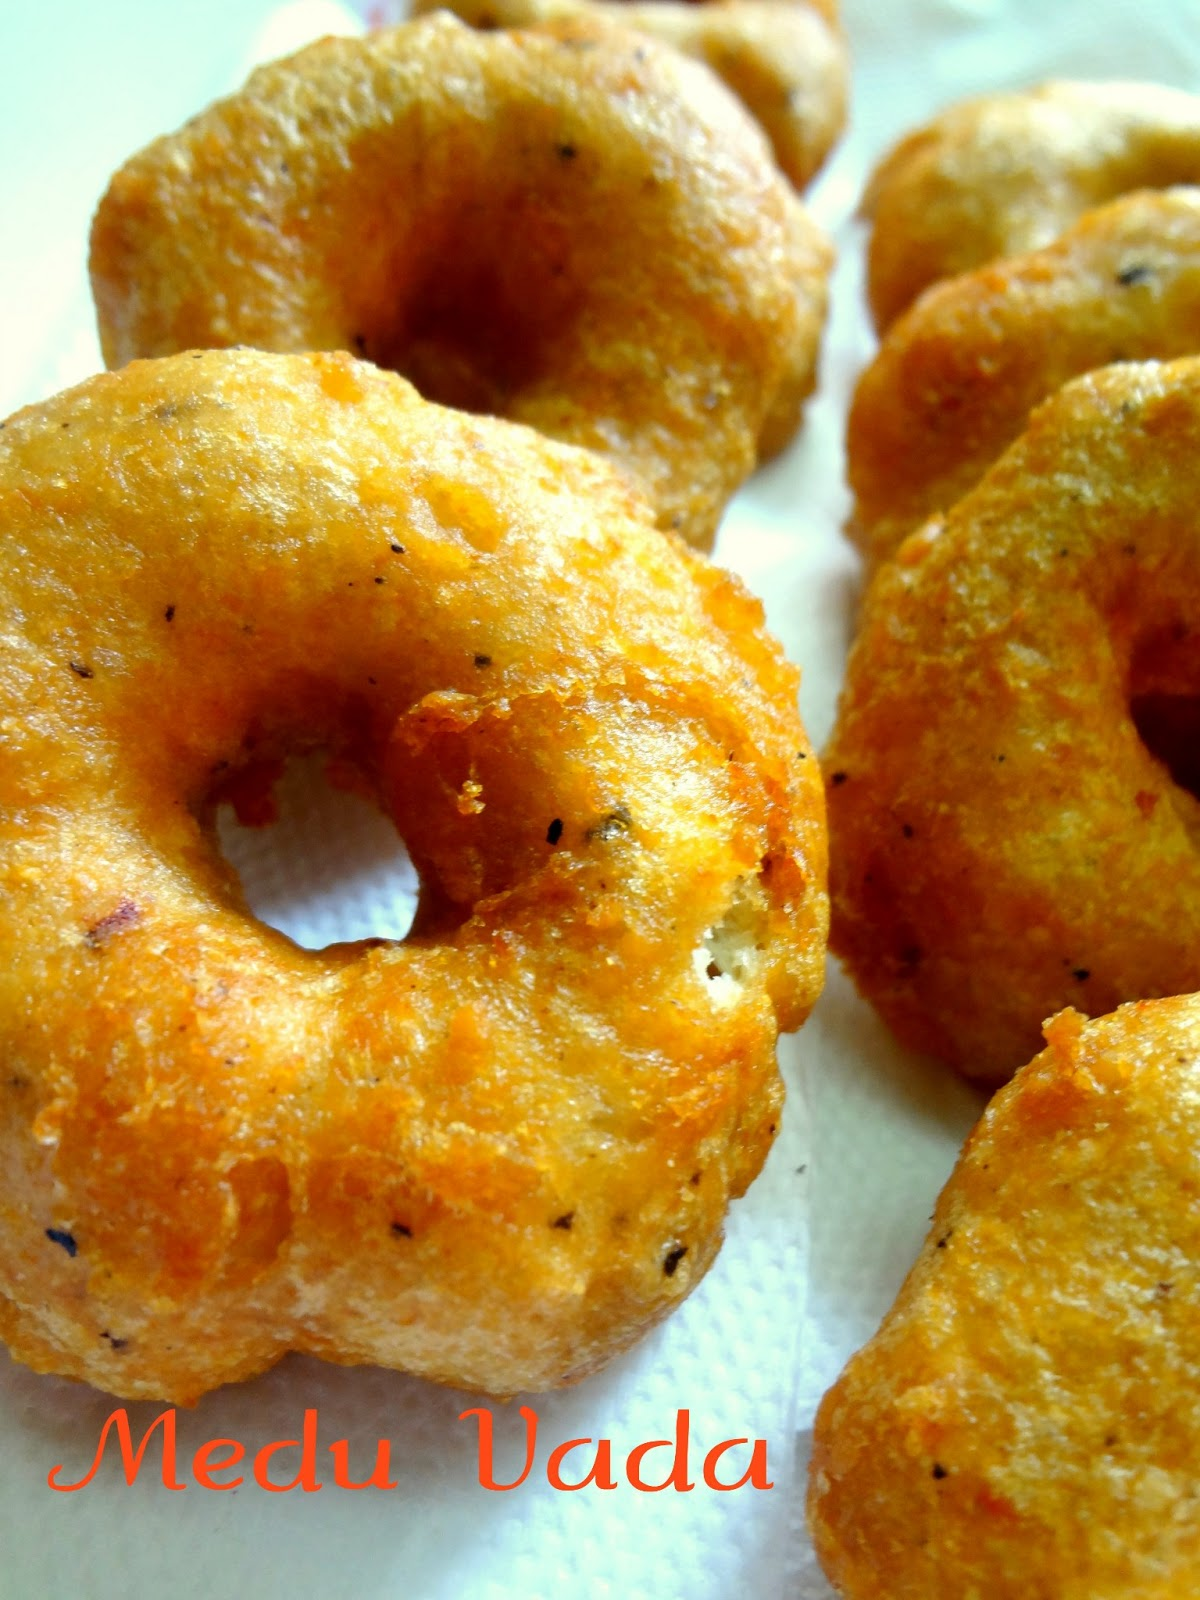 Medu vada recipe in mixie uddina vada medhu vadai ulundu vadai